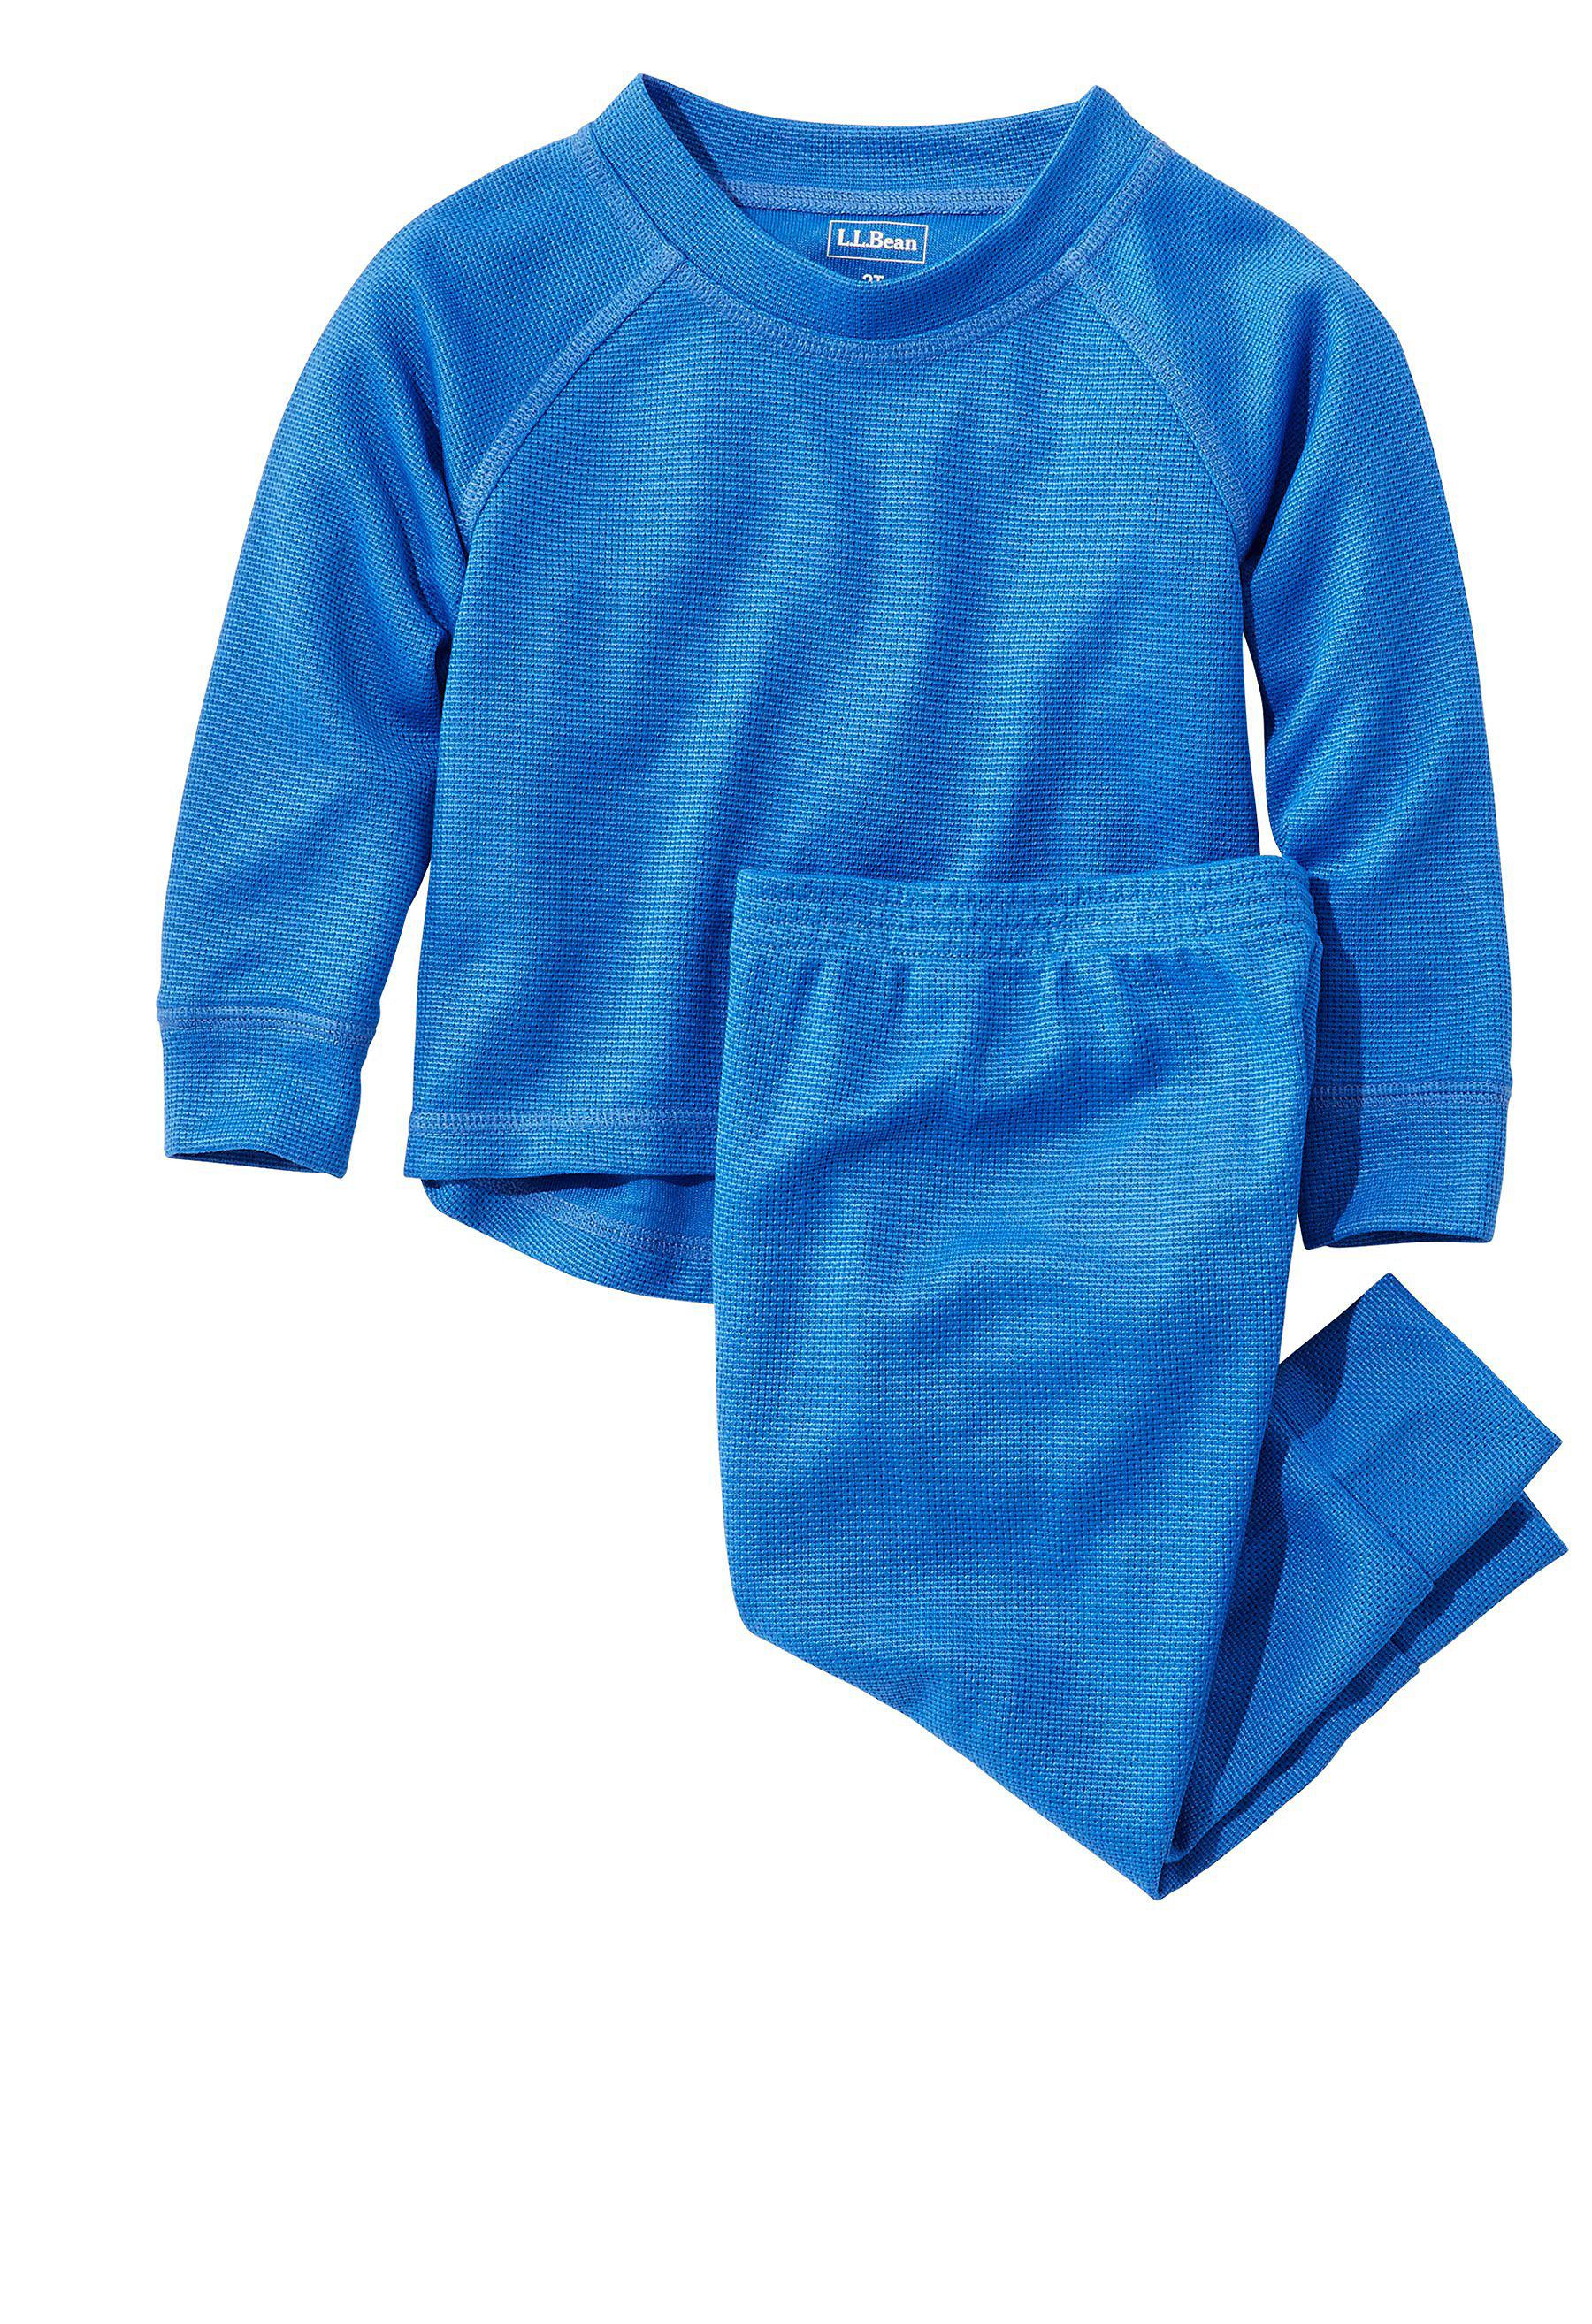 Kids' Wicked Warm Midweight Underwear Set, Toddlers' | Free ...